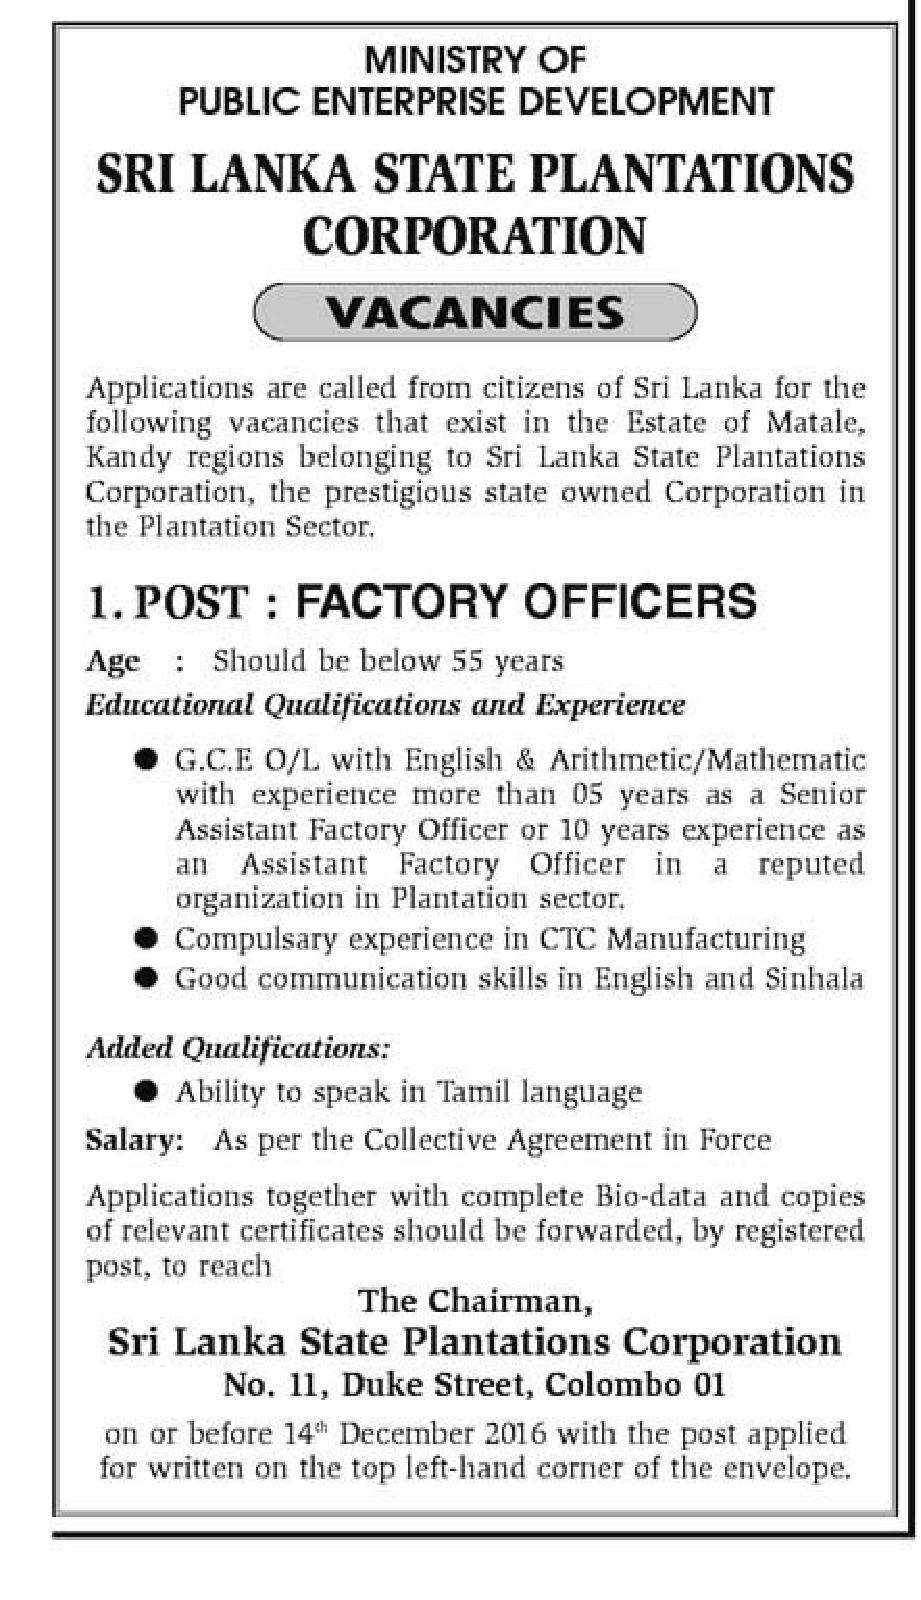 Sri Lankan Government Job Vacancies at Ministry of Public Enterprise Development, Sri Lanka State Plantations Corporation.